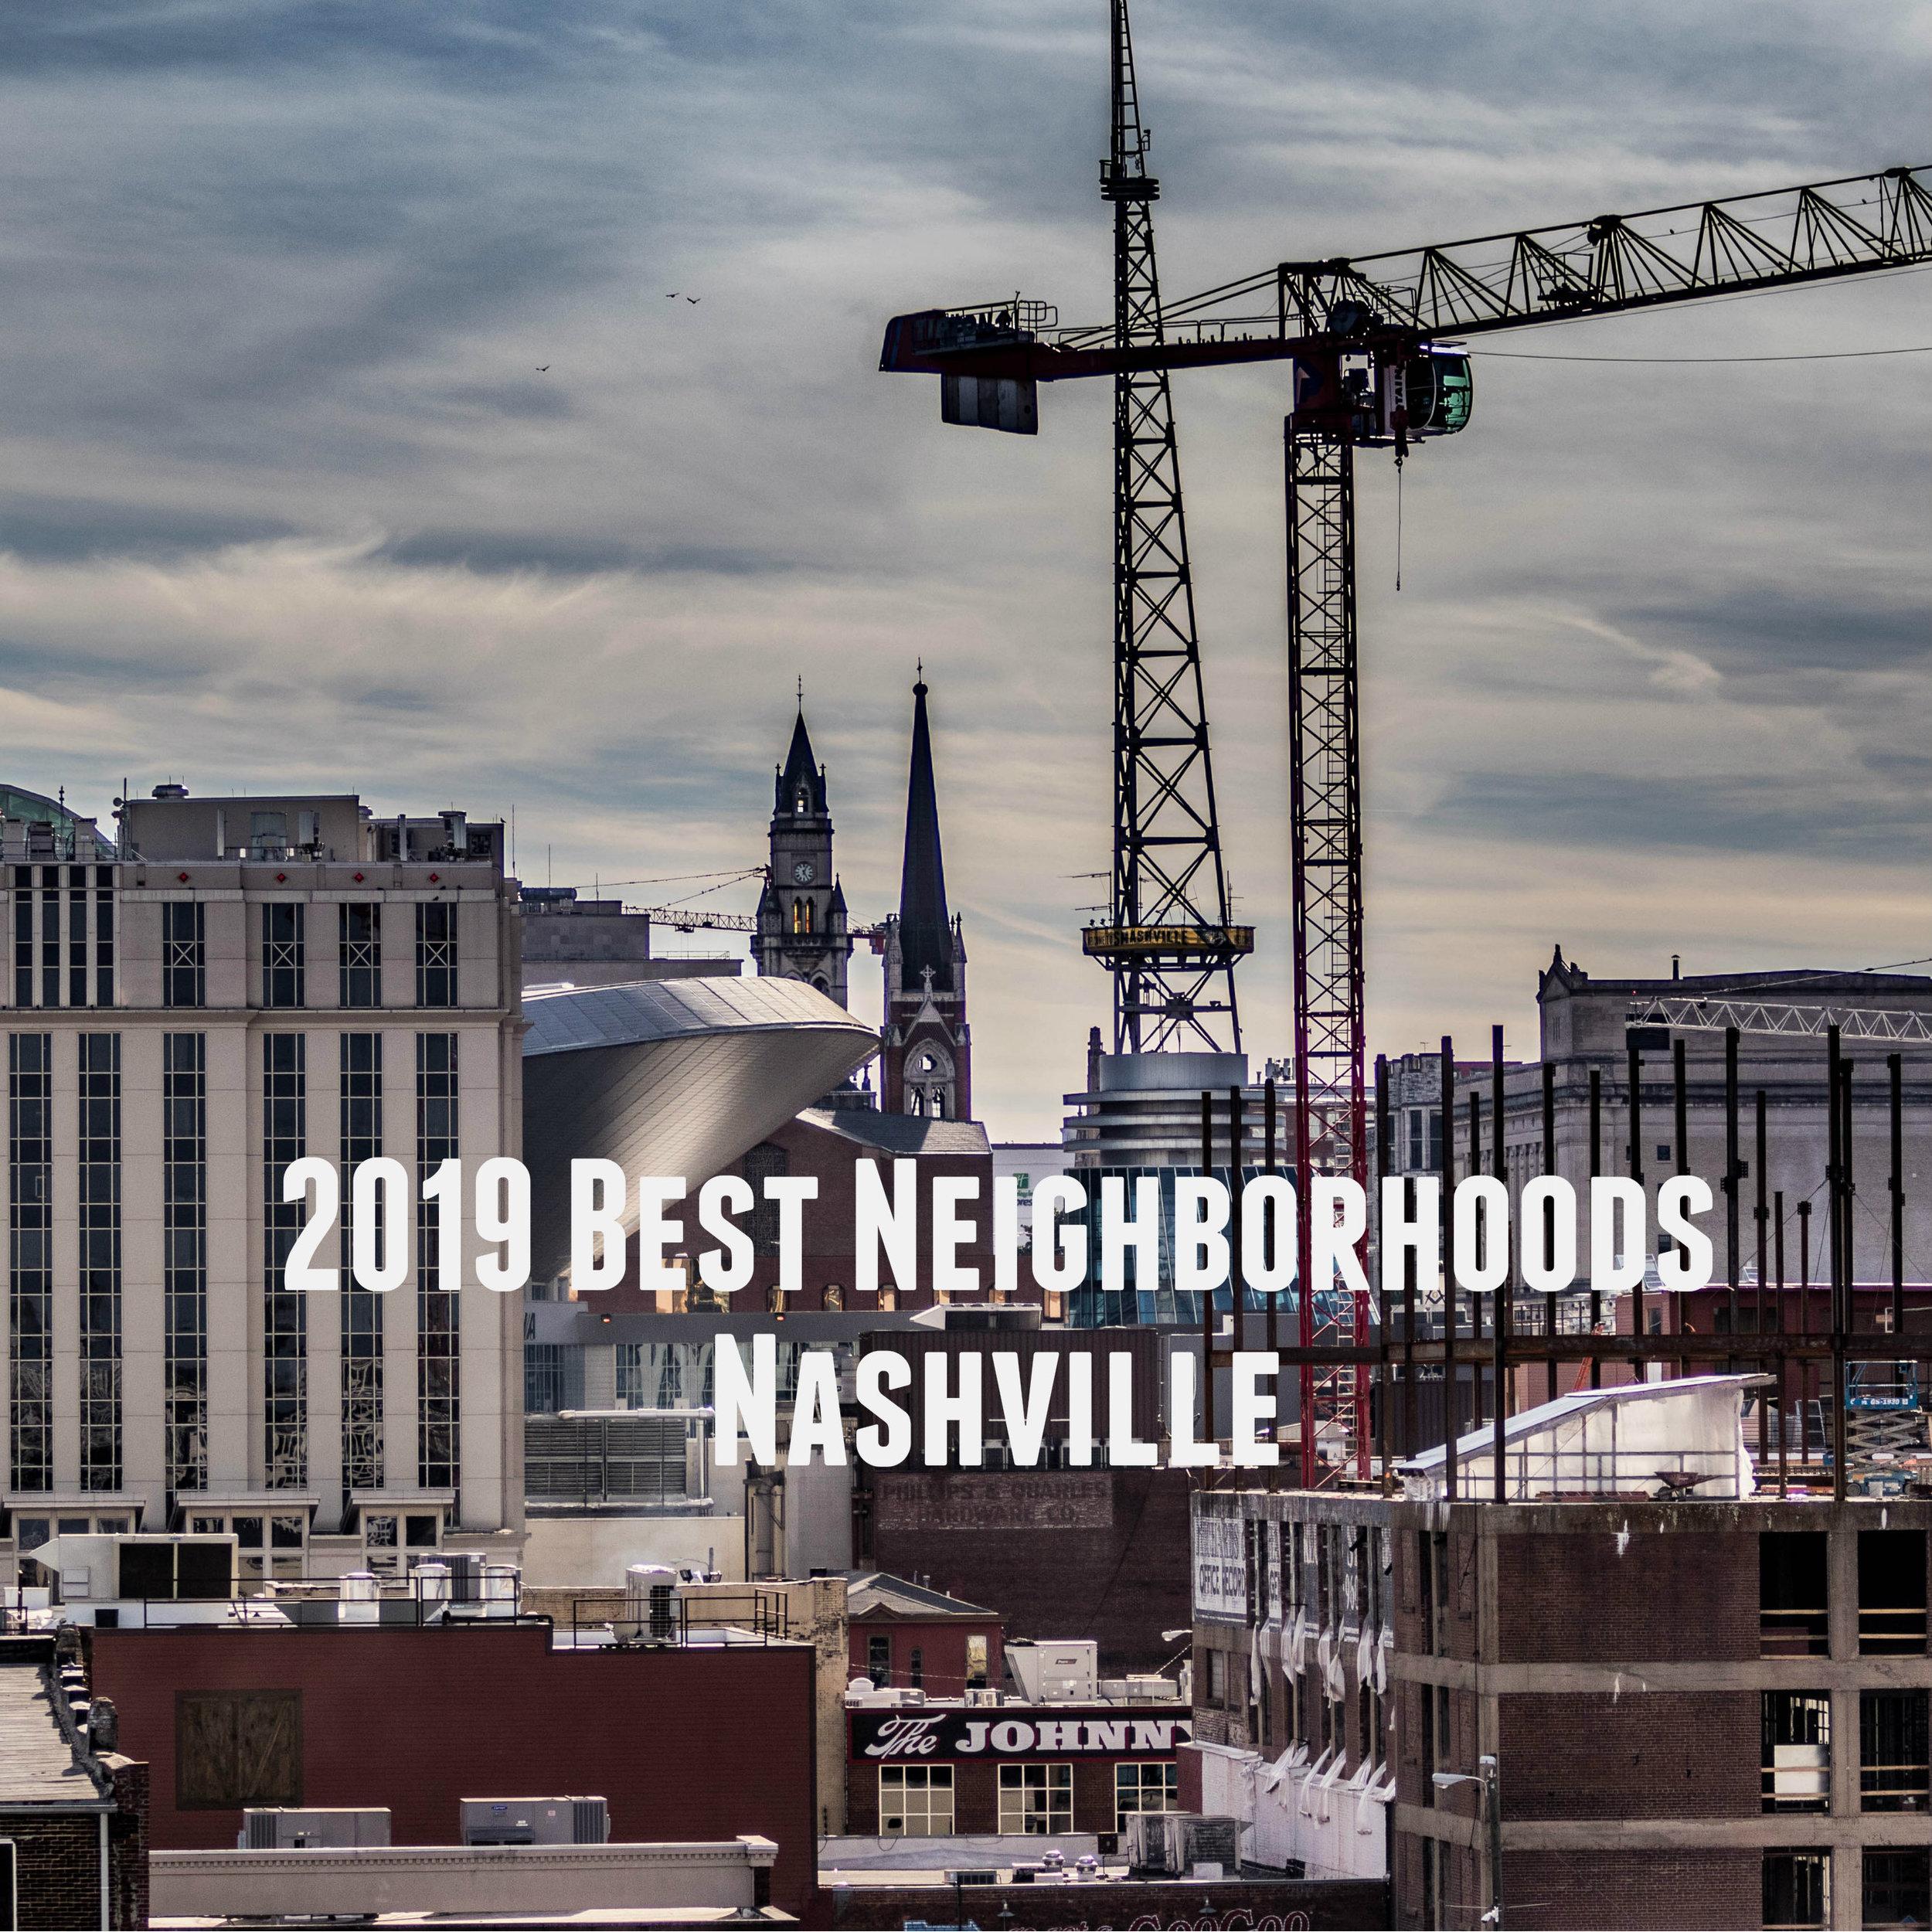 2019 best neighborhoods nashville